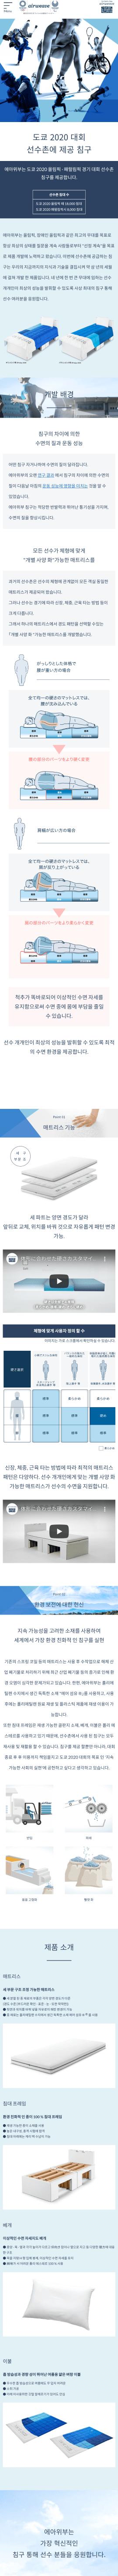 viewimage.php?id=2fbcc323e7d334aa51b1d3a24781&no=24b0d769e1d32ca73feb86fa11d02831b7cca0f2855e21730c724febbe0c6d516034abb83a2a05bfacaa4b0225202c89e611fab7cd1a8eb749ca7ab369ae5e96be5ba2418db622eb82c9894cf825224ce0e0a257c42cecc34bf40d4a2b067bbeb7fba718c934d4dcbab7fcc013